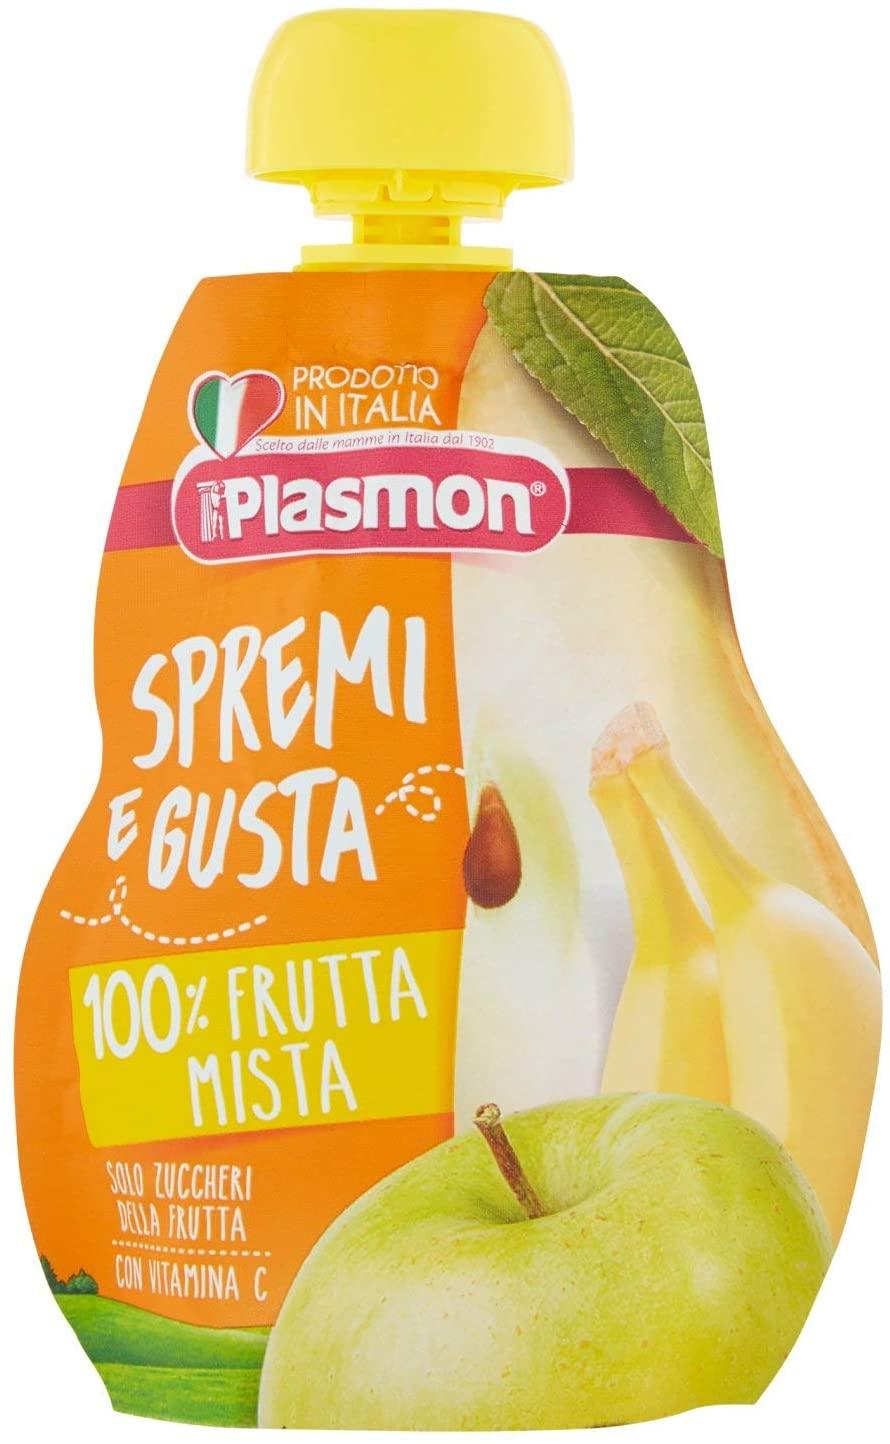 Plasmon Spremi e Gusta Frutta Mista, 100 g